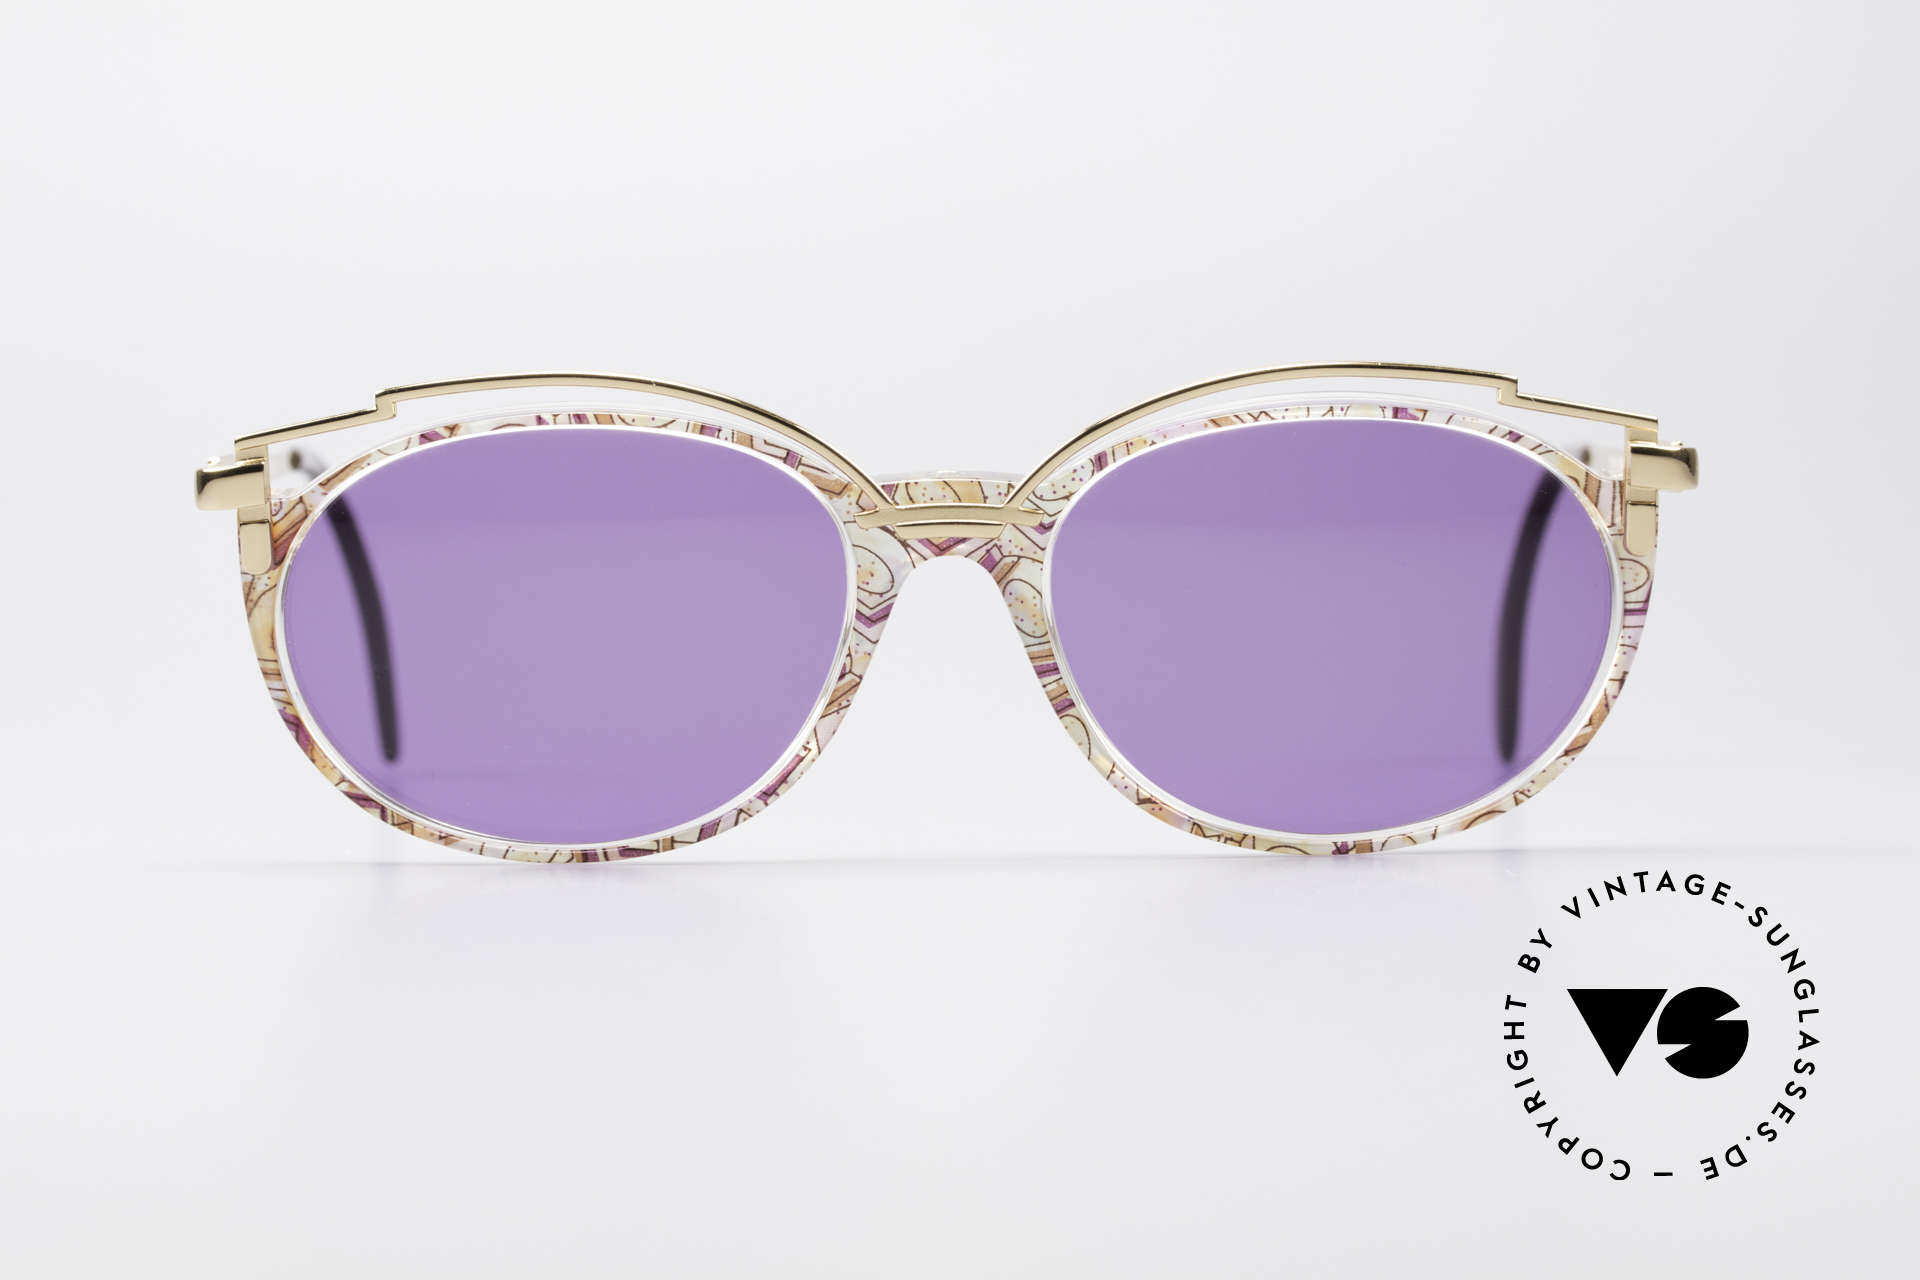 Cazal 358 Rare 90's Vintage Sunglasses, delightful metal ornamentation above the plastic frame, Made for Women